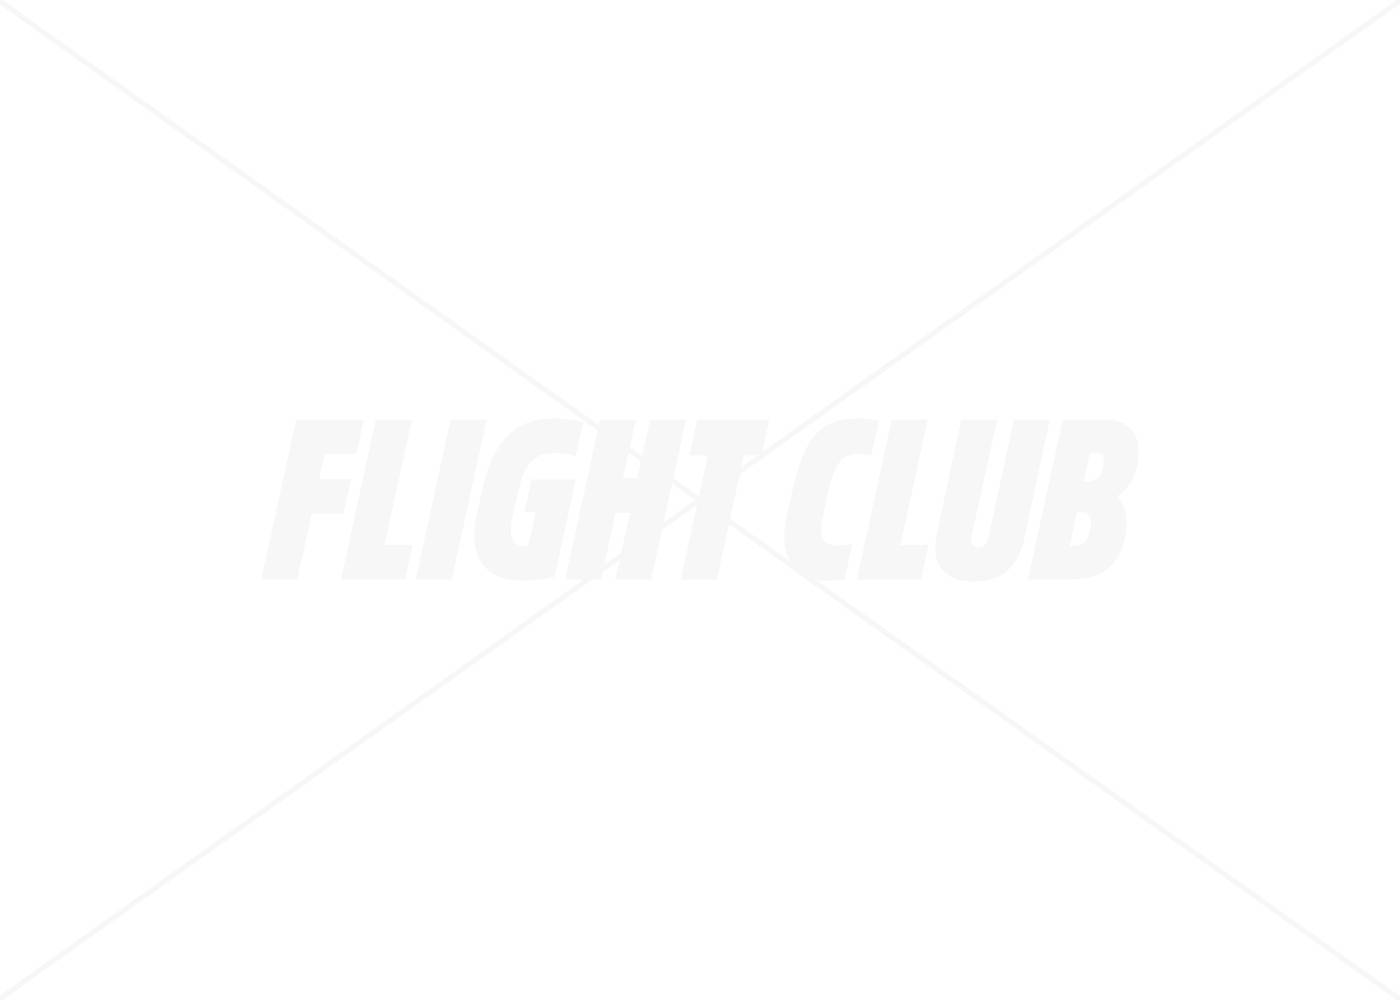 7c814bdc6a1efb Air Jordan 1 Mid BG - Air Jordan - 554725 605 - gym red white-black ...